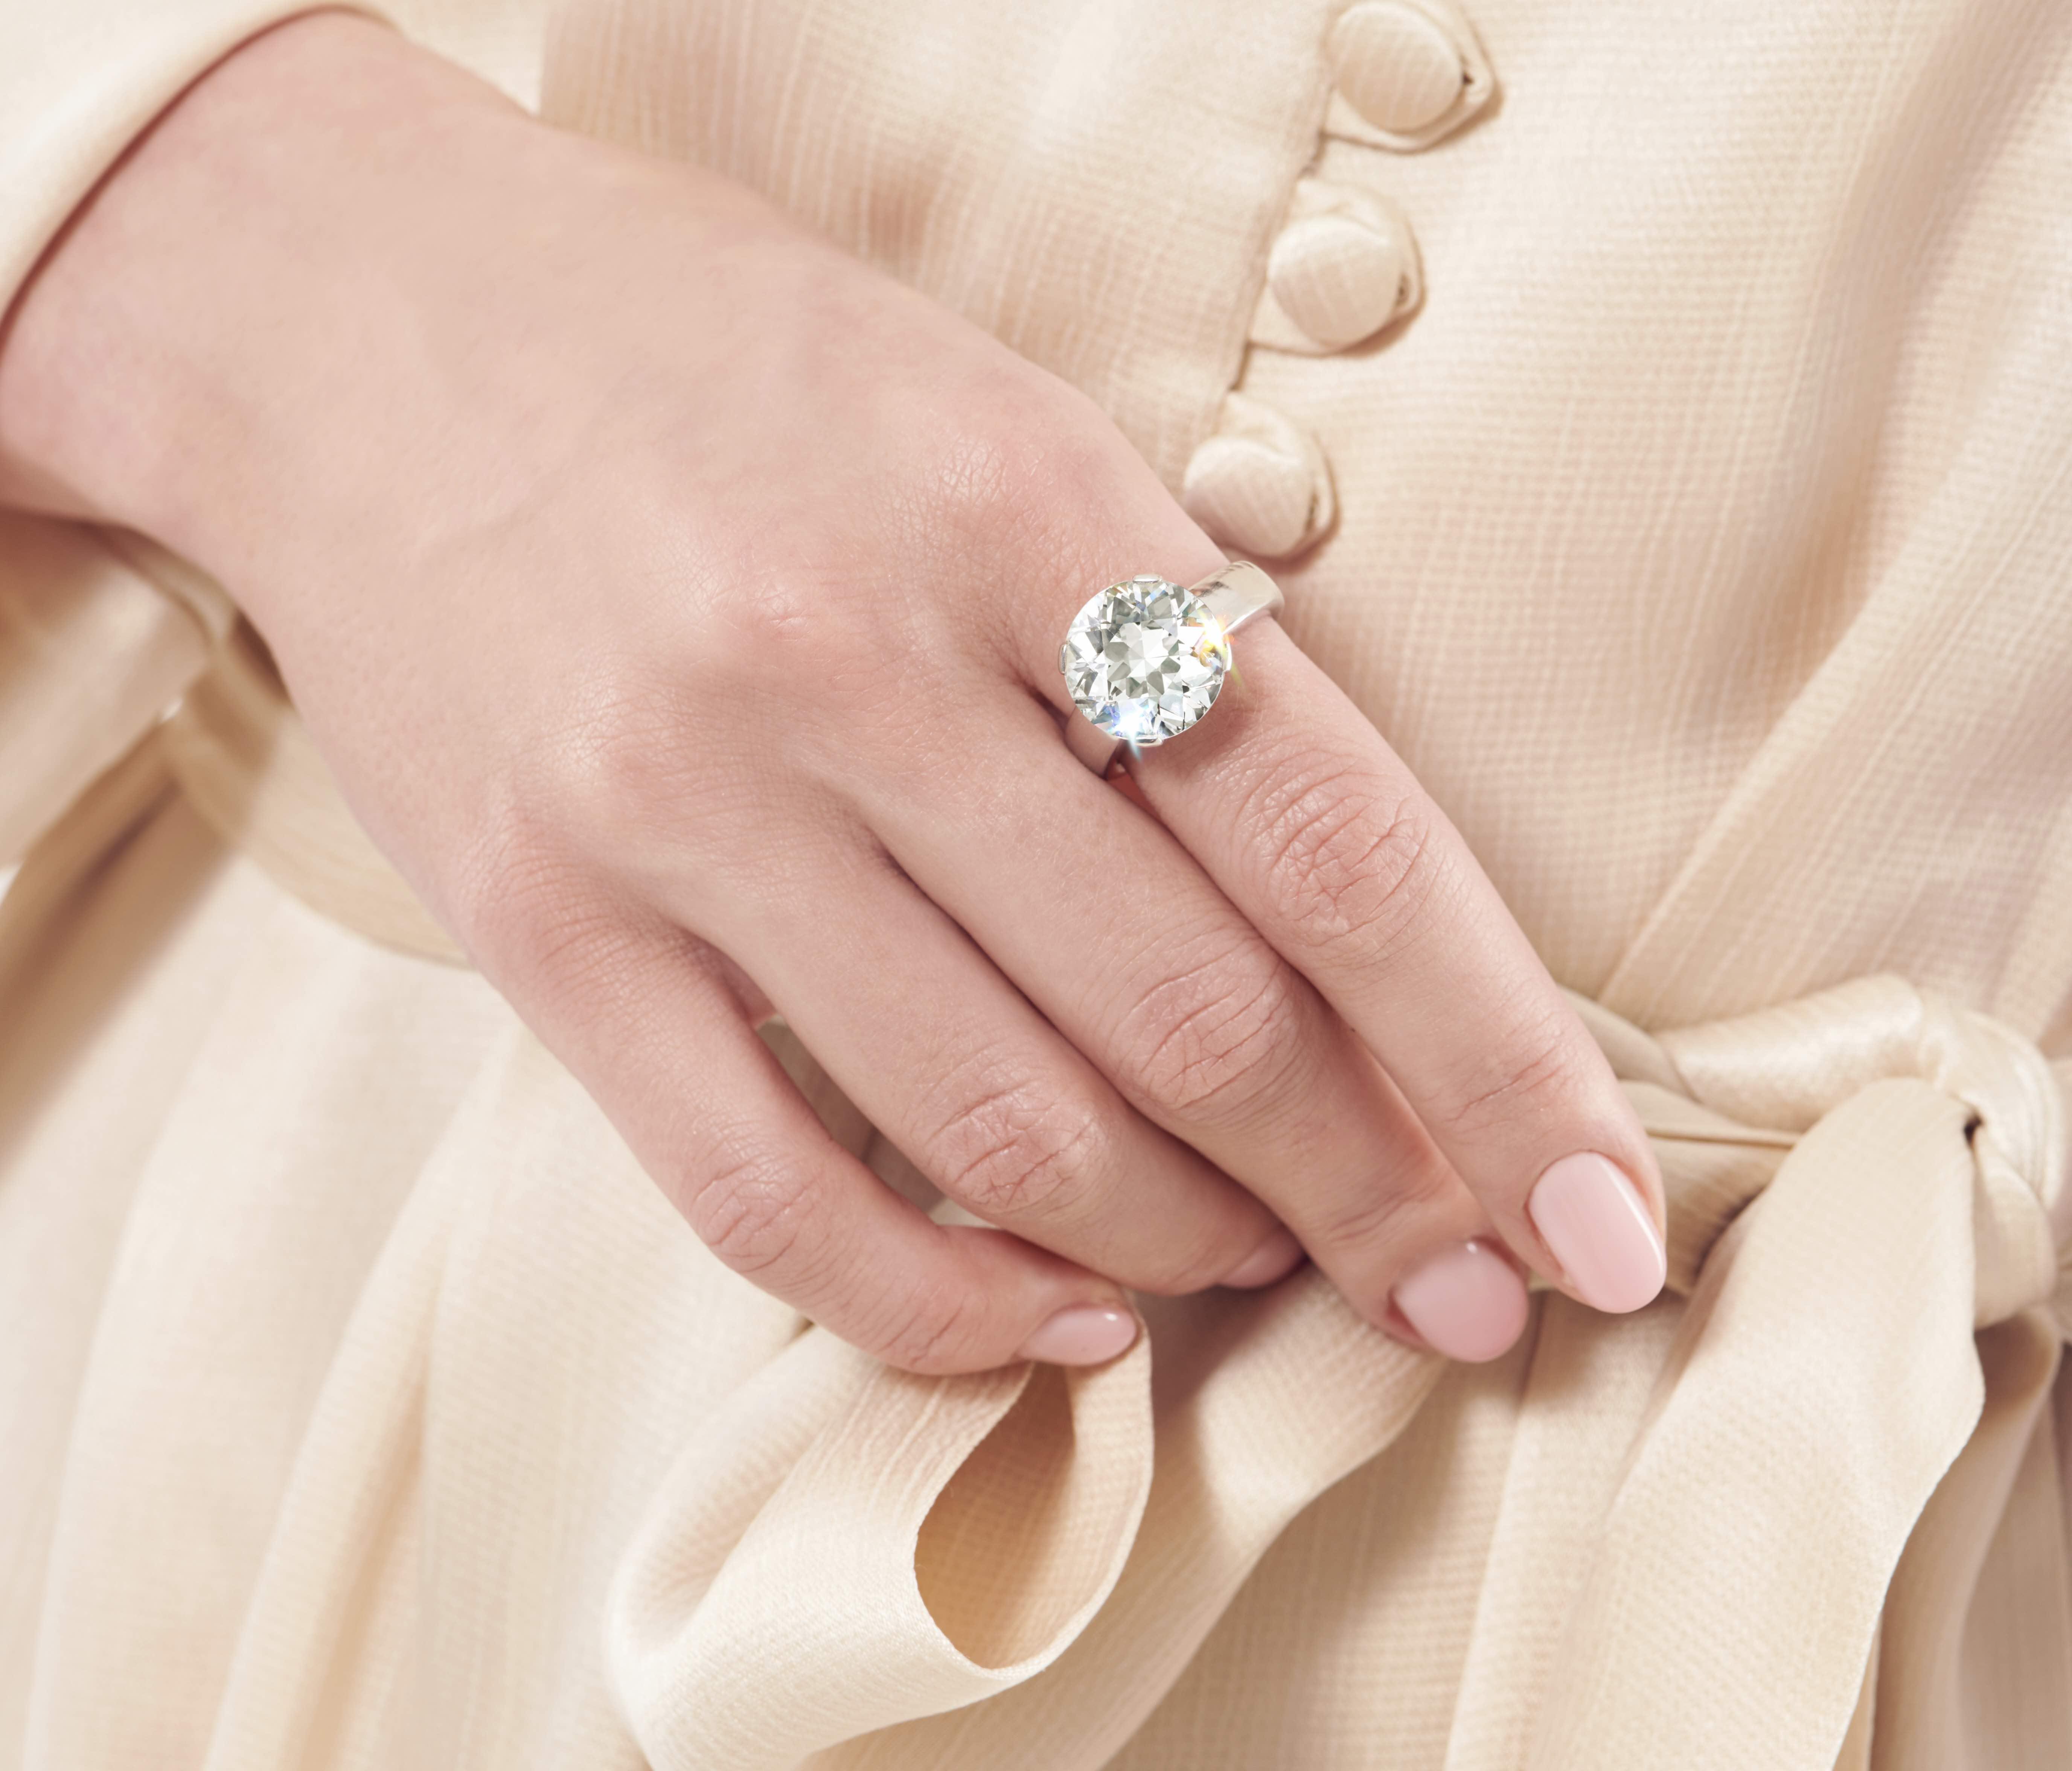 Diamonds, The Most Popular Gemstone